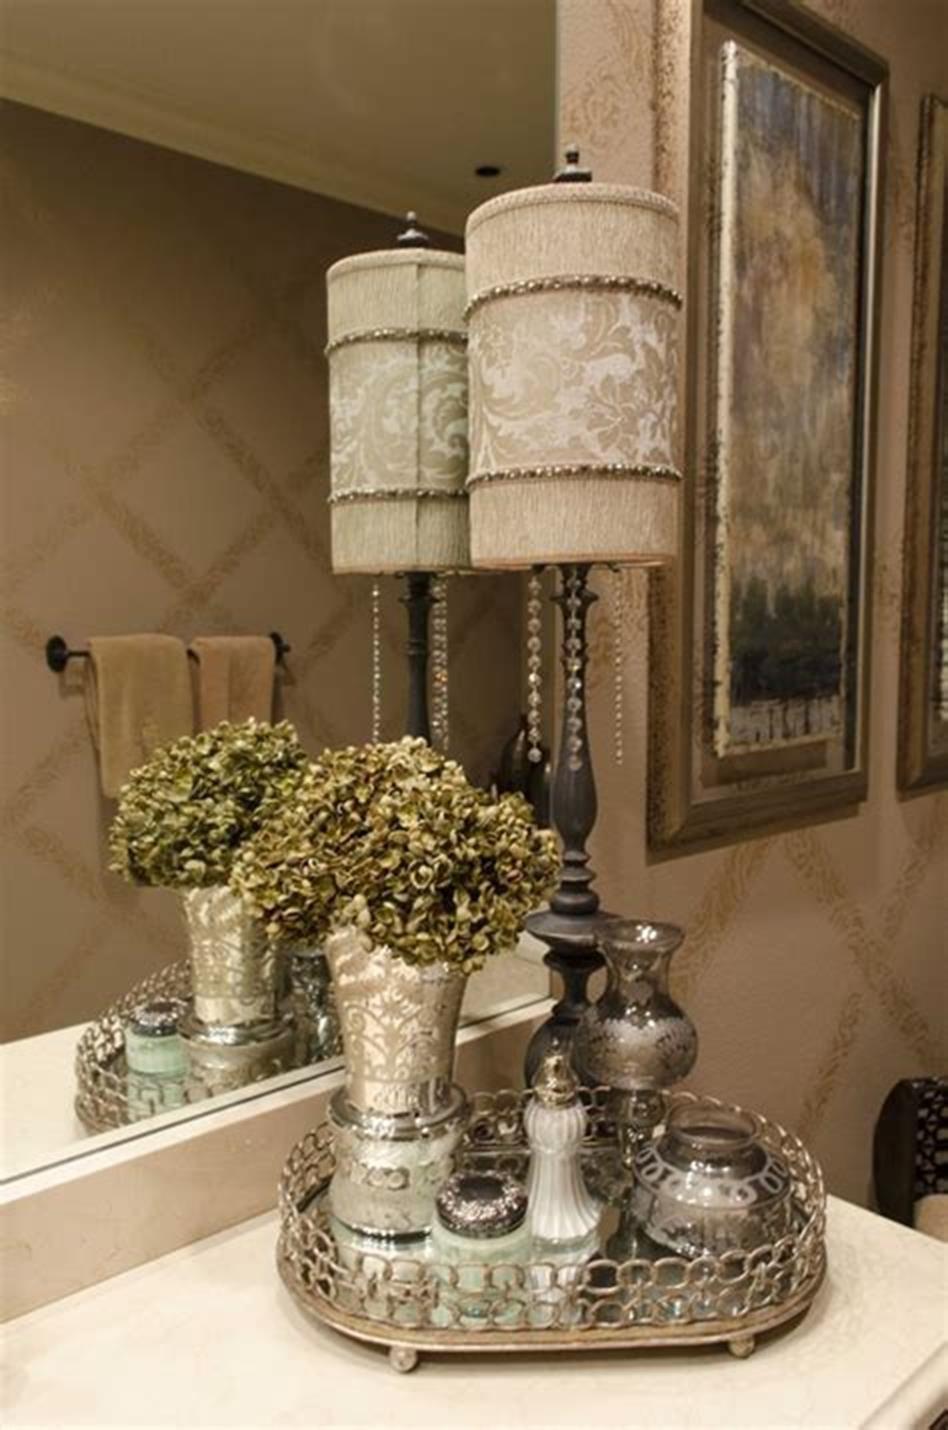 40 Beautiful Bathroom Vanity Tray Decor Ideas 2 Decorecent Beautiful Bathroom Vanity Tuscan Bathroom Decor Bathroom Counter Decor